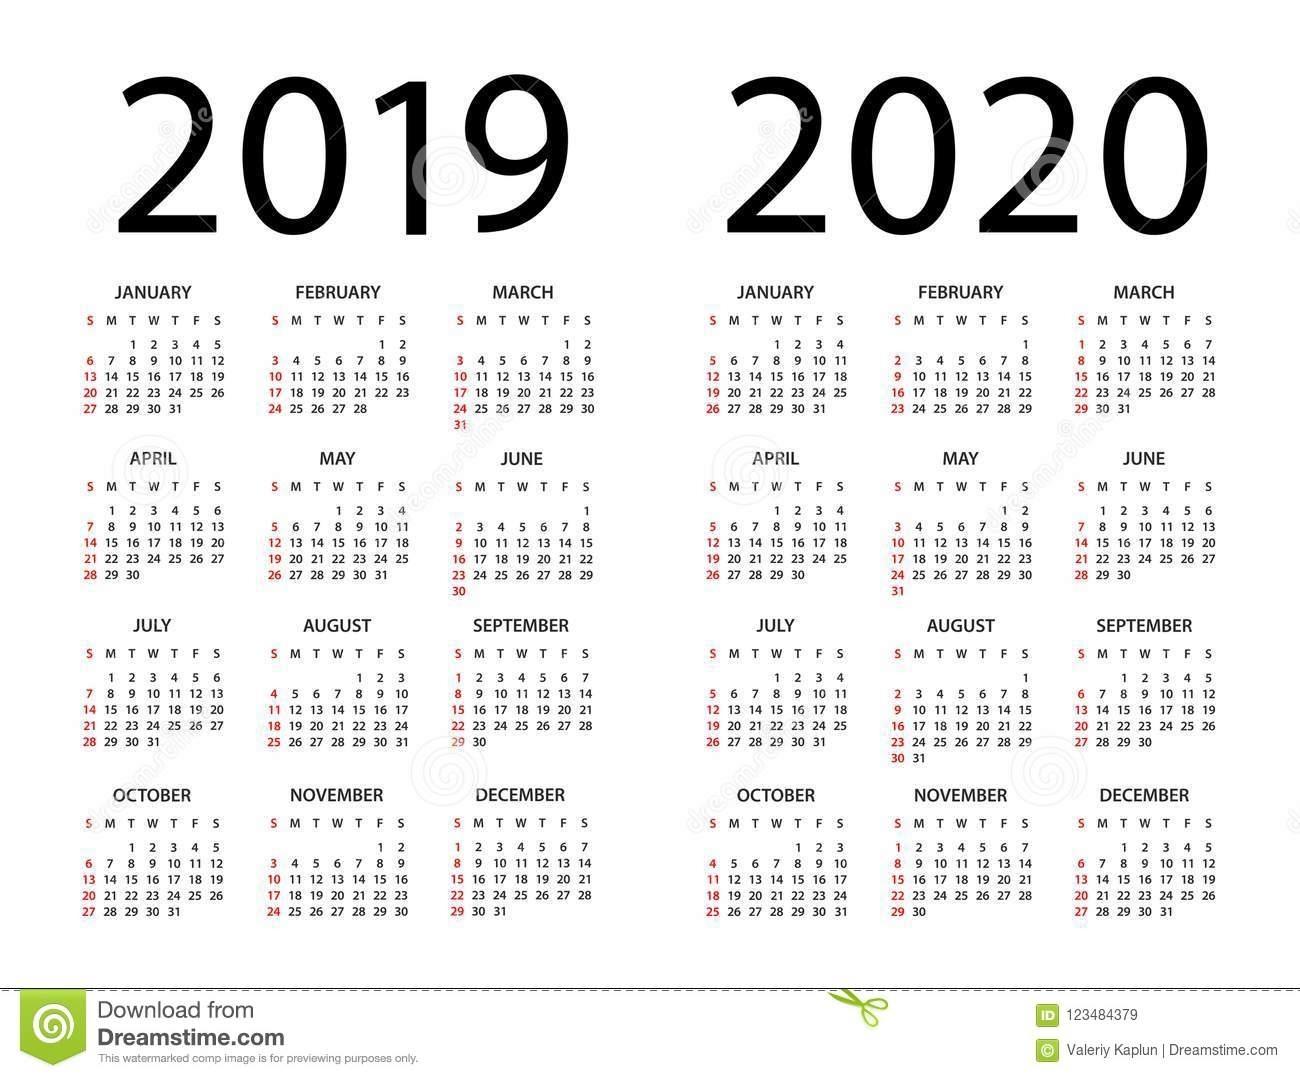 Calendar 2019 2020 - Illustration. Week Starts On Sunday Stock with Weekly Free Print Calendar 2019 2020